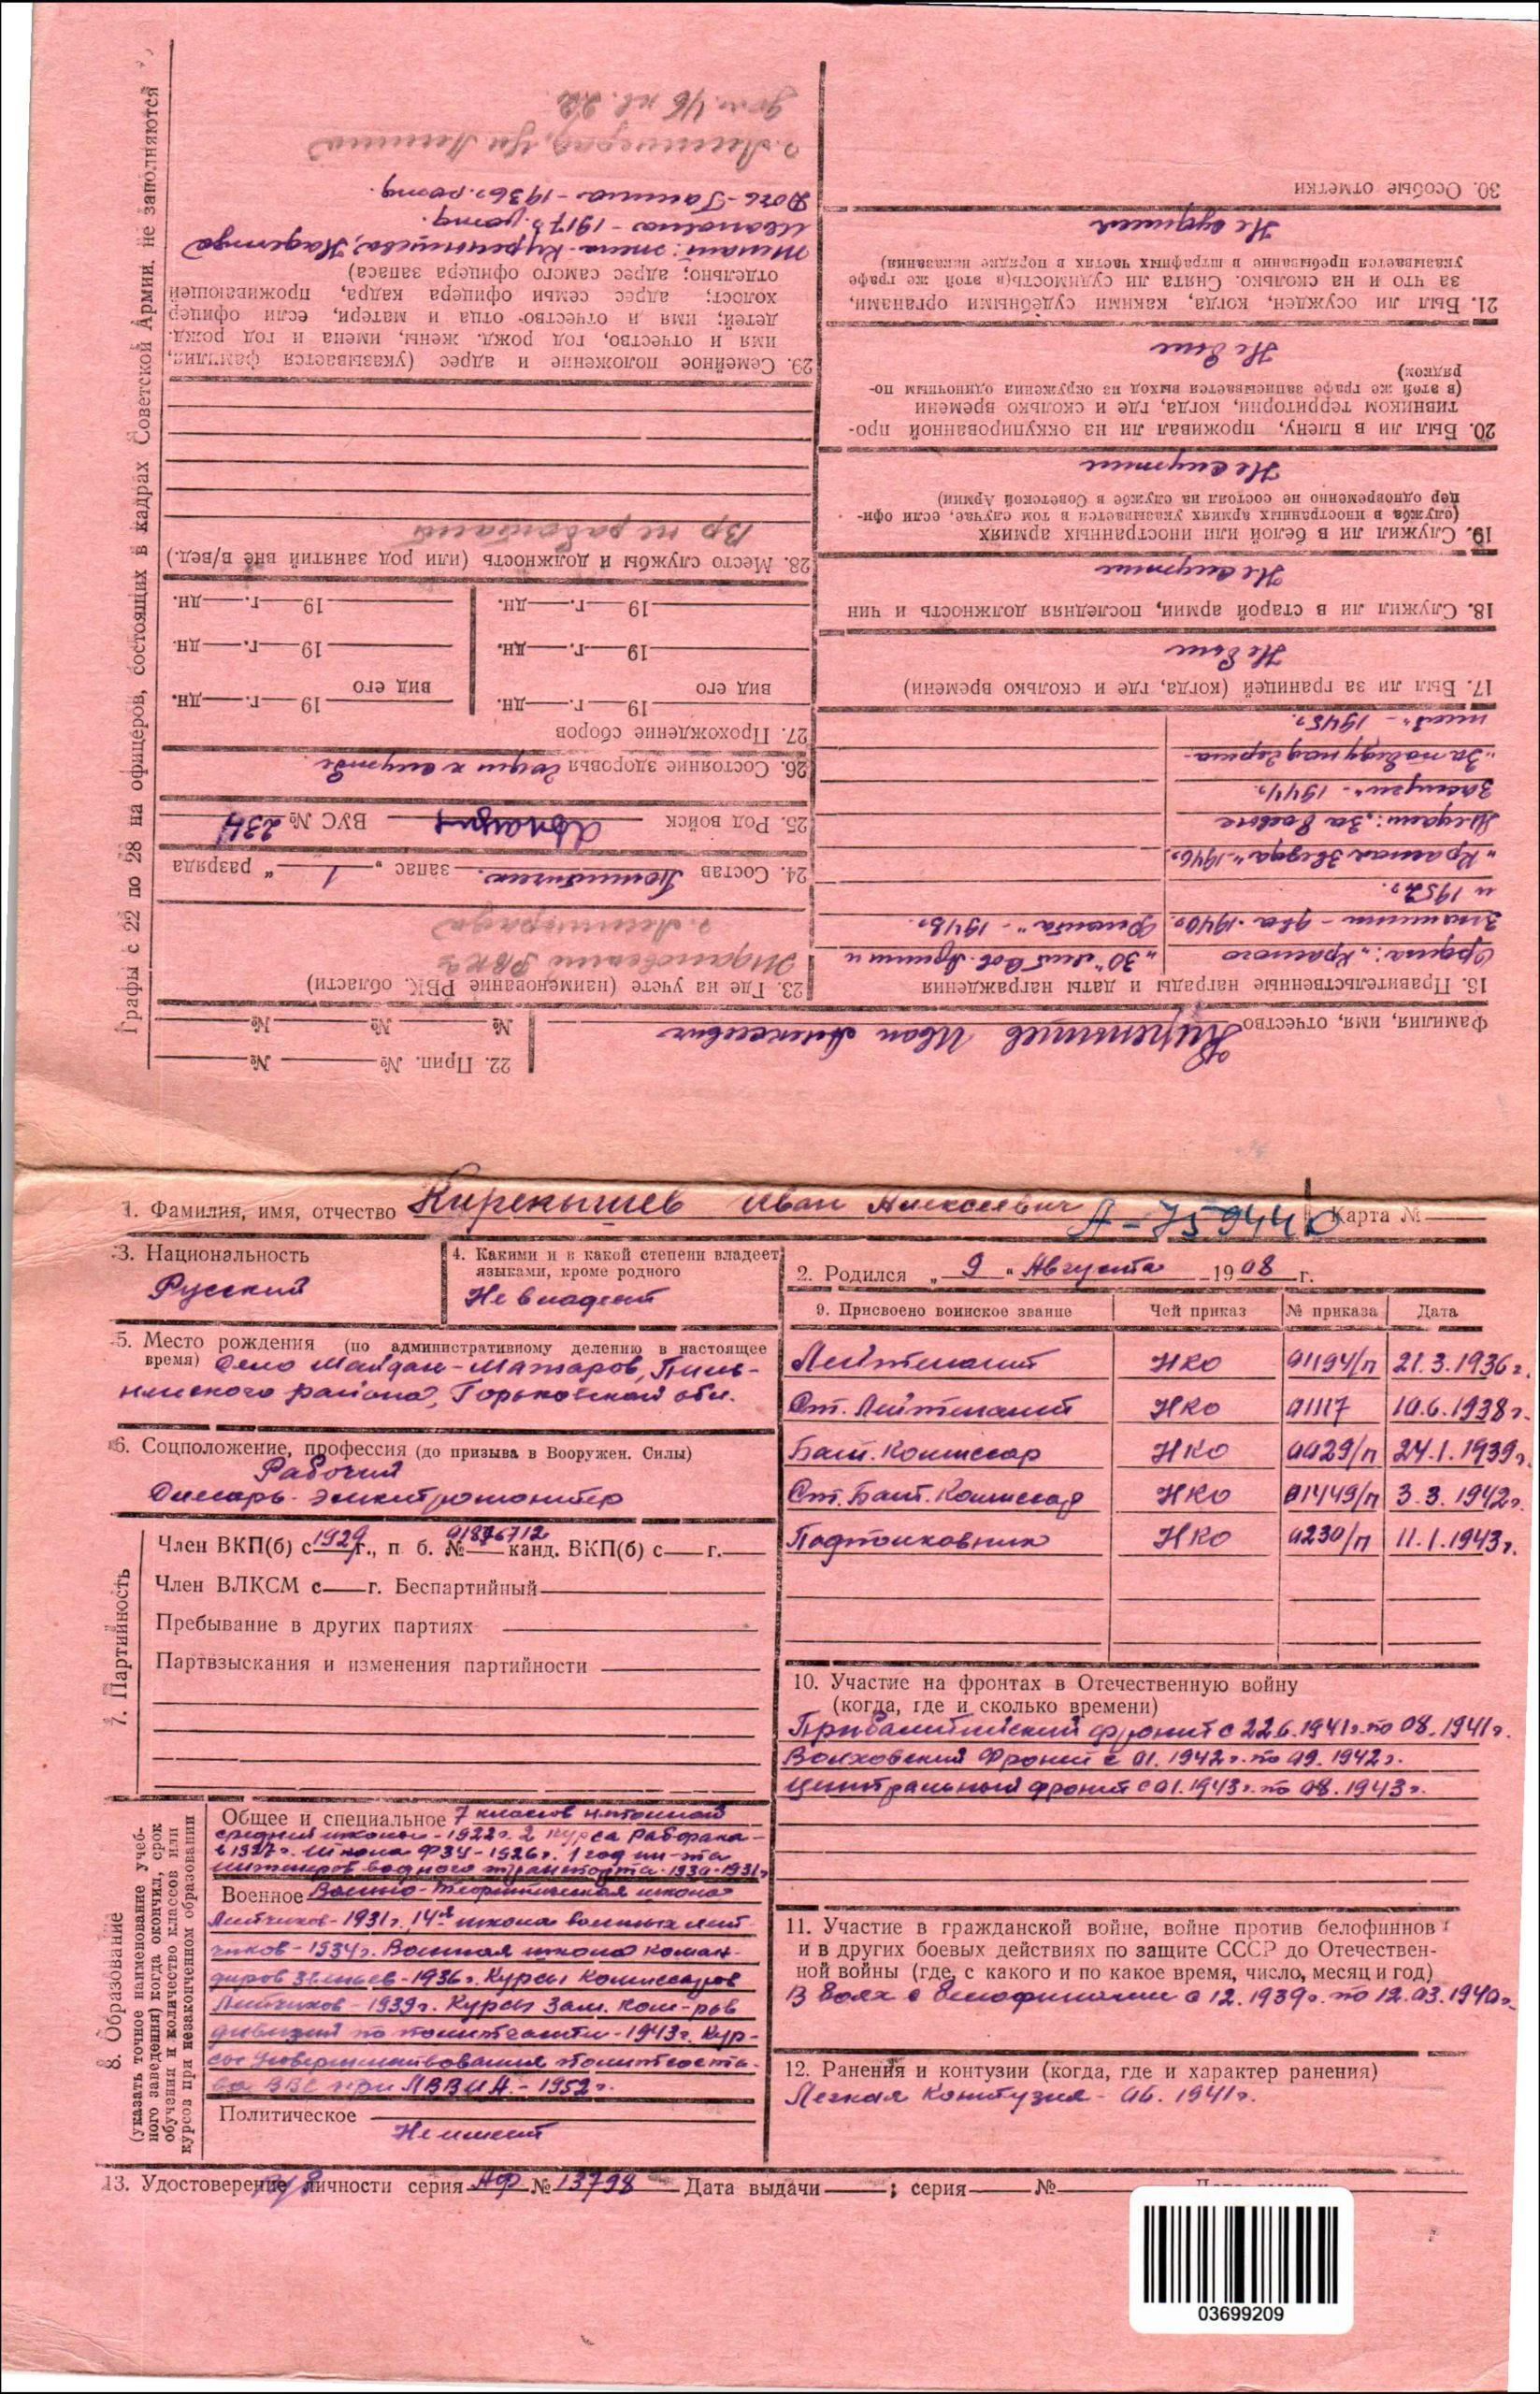 Service record of Kirenyshev